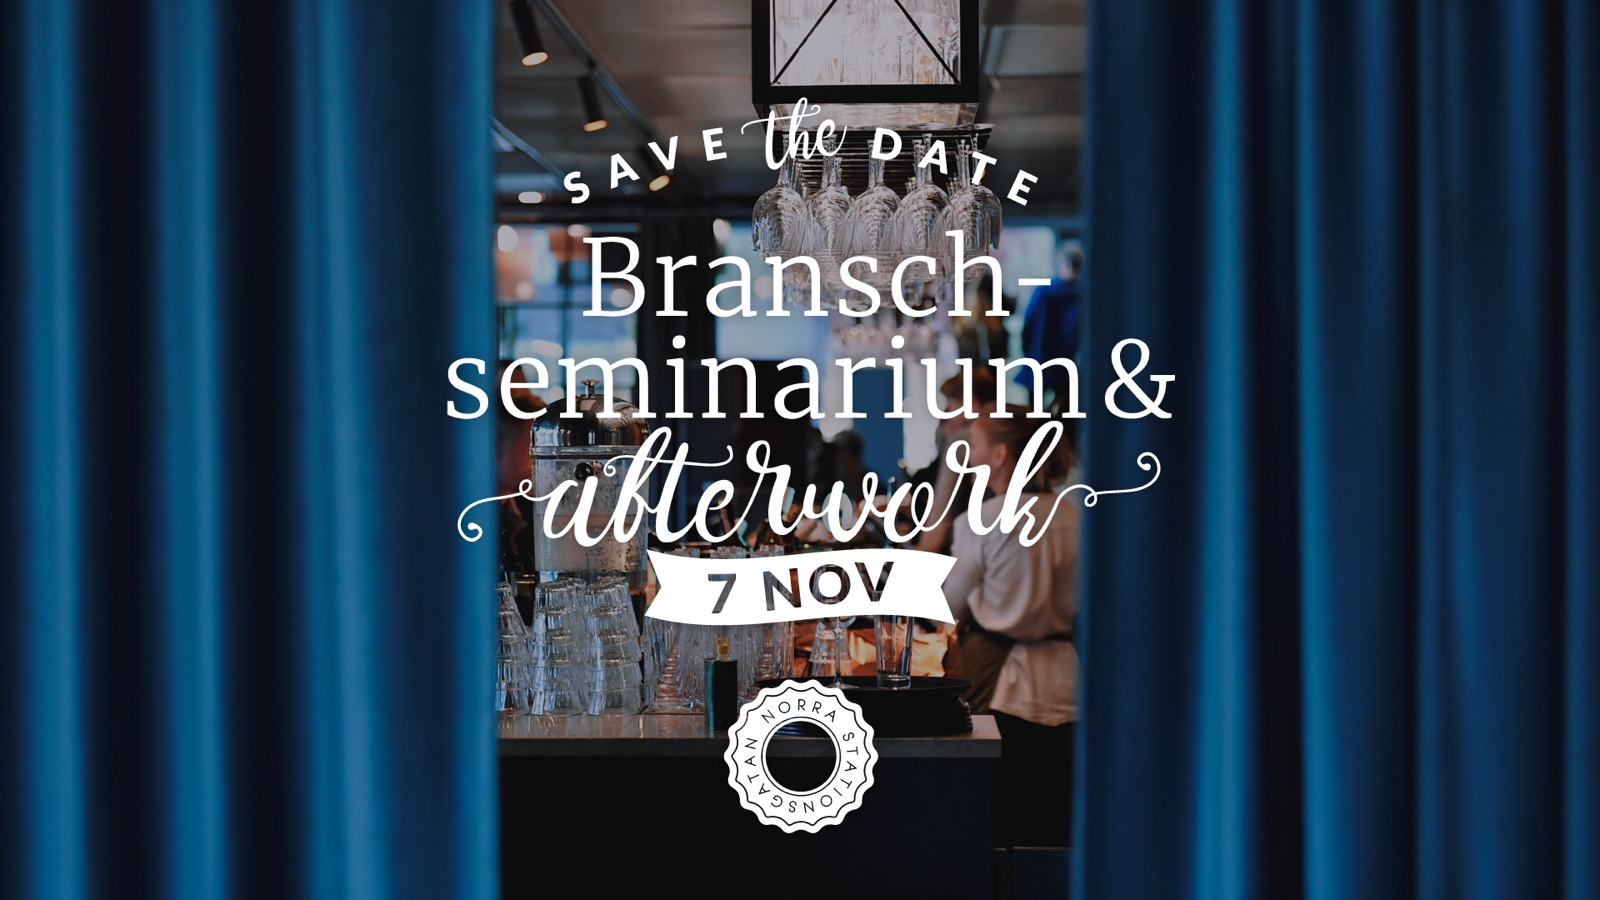 NSG-Save-the-date-Branschseminarium+AW-Nov-2019-resize-1600.jpg